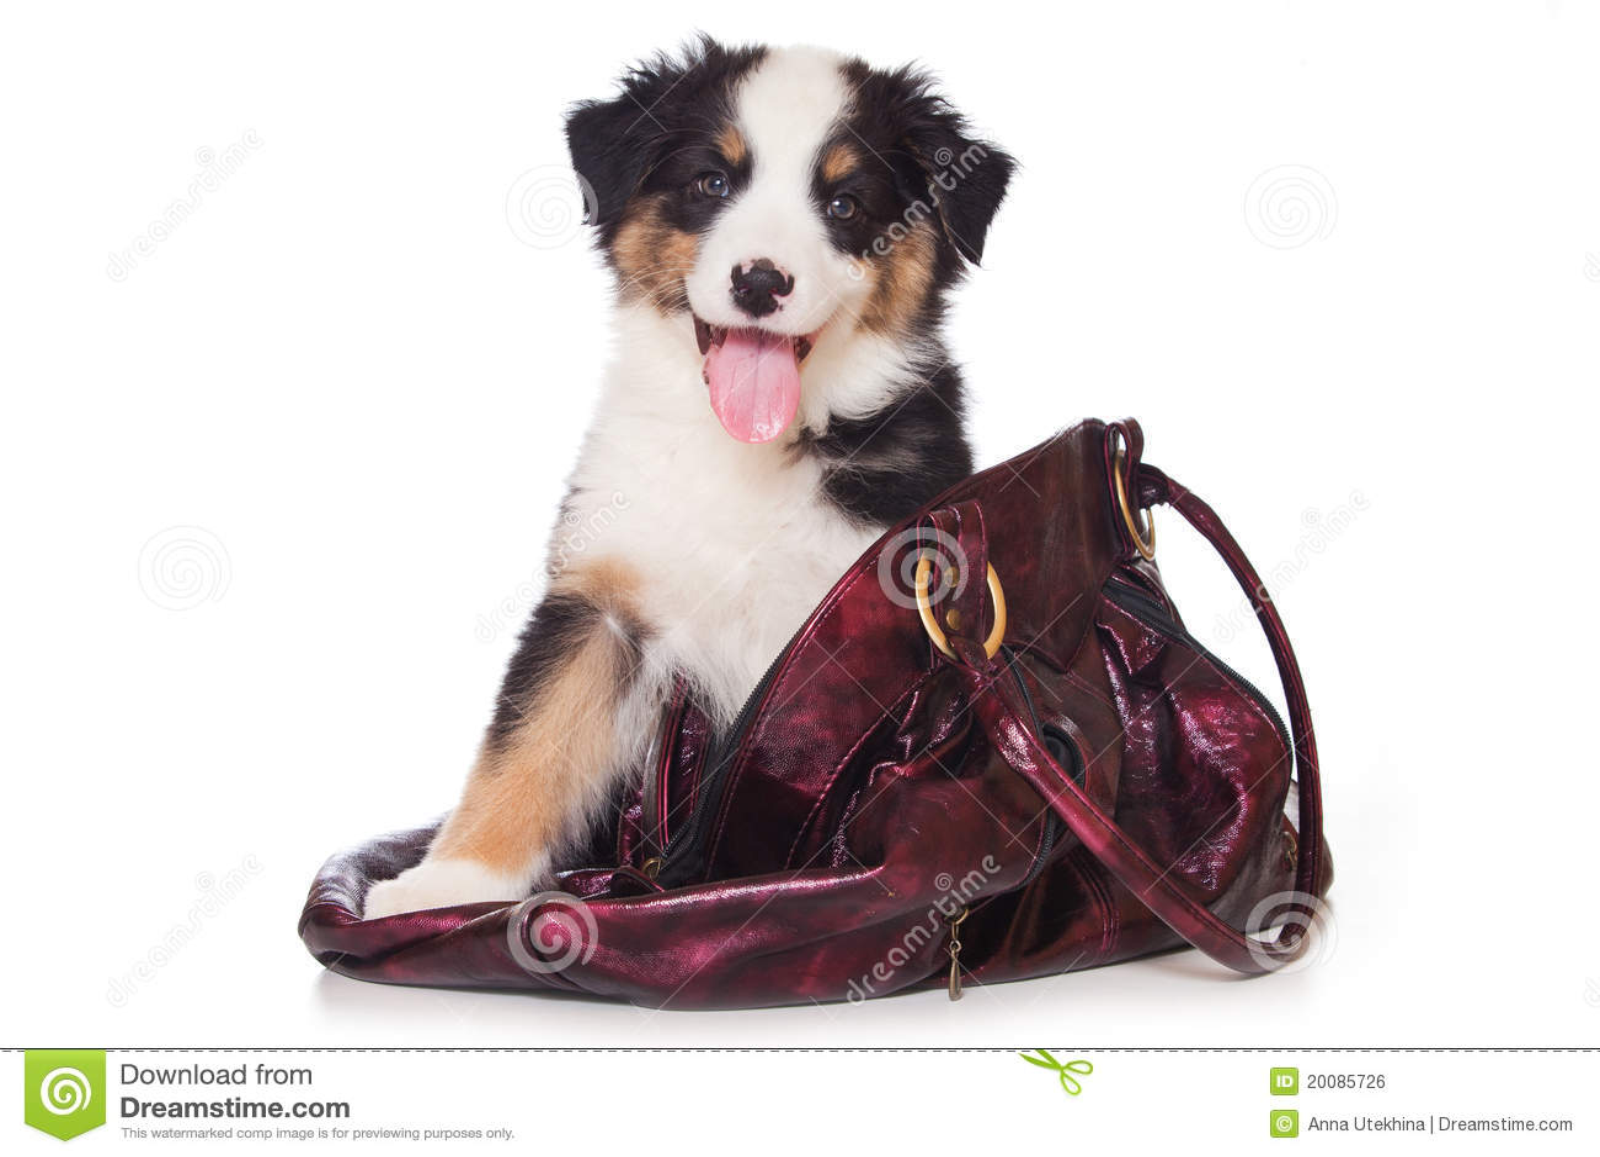 Royalty Free Stock Image: Australian Shepherd dog